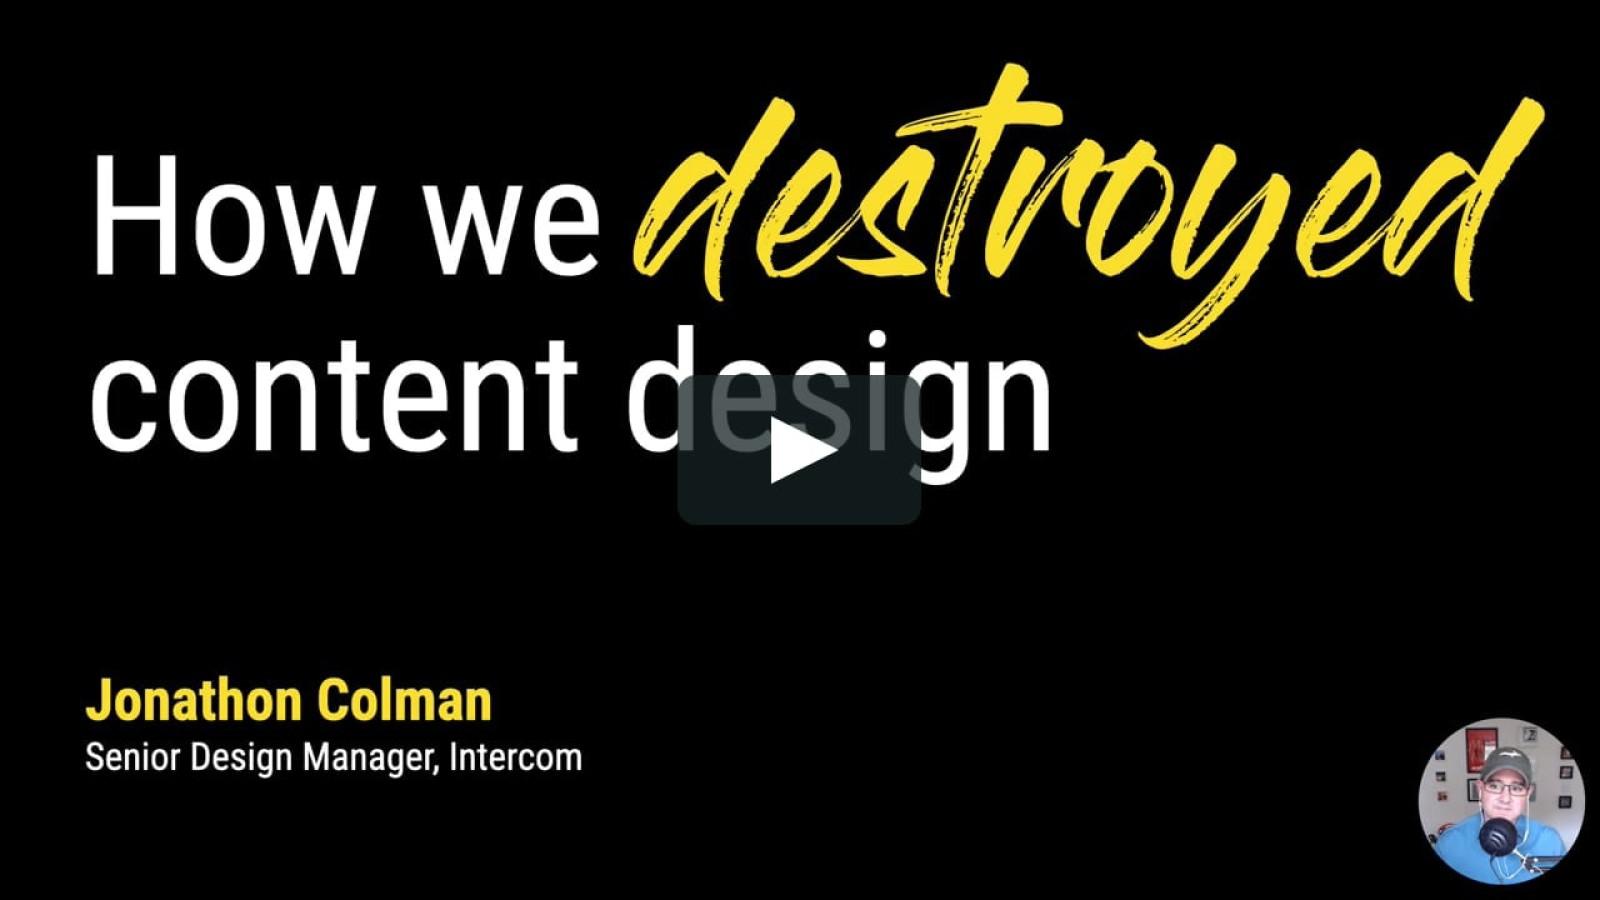 Keynote: How we destroyed content design